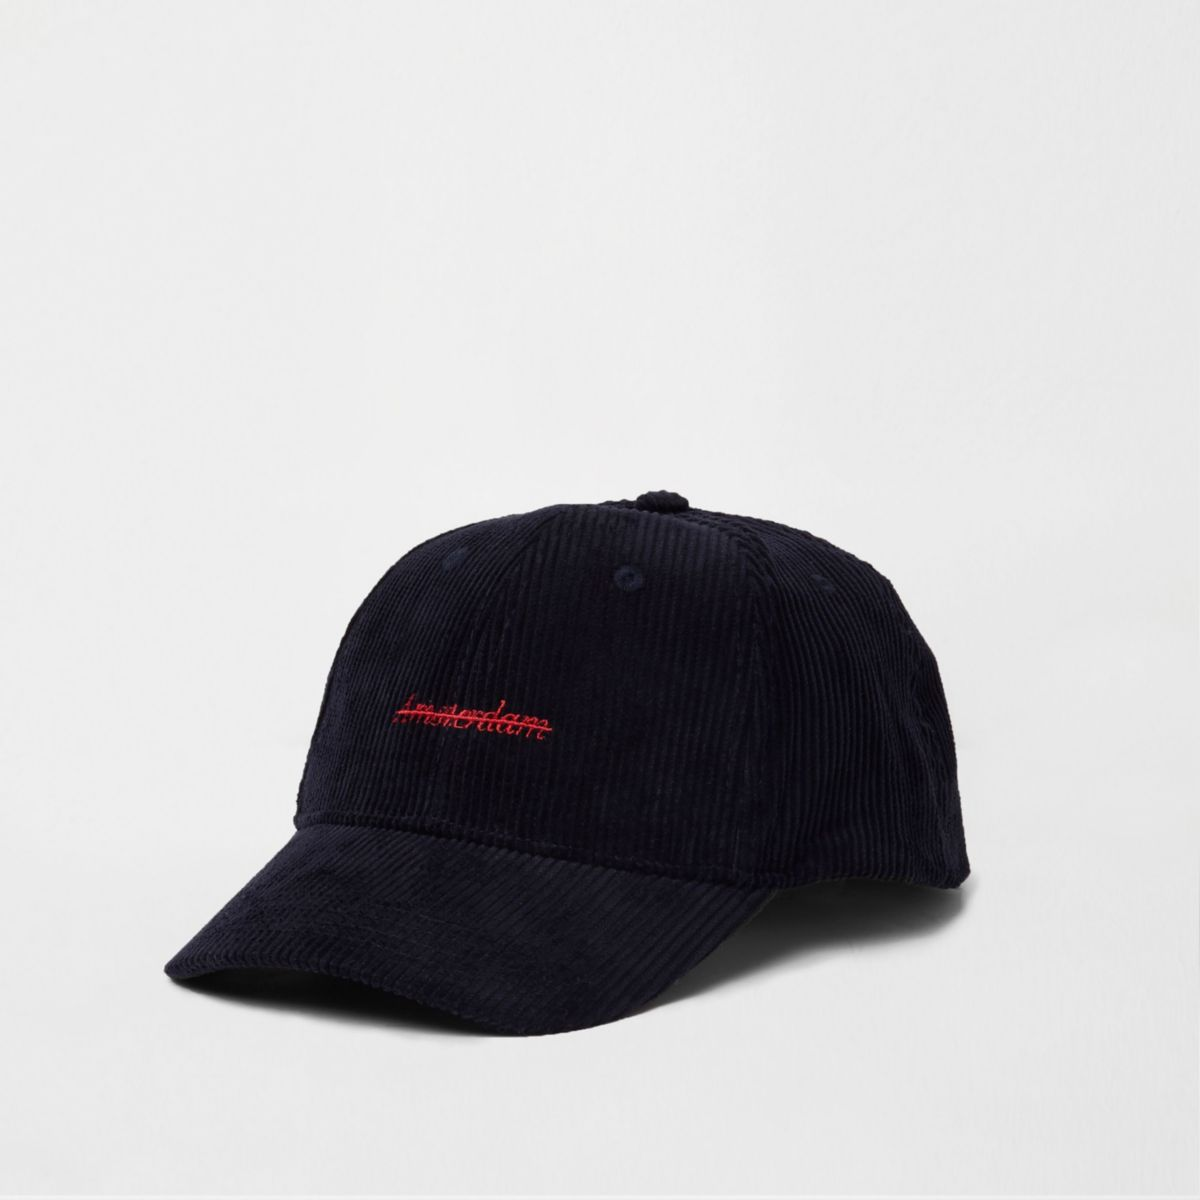 Navy 'Amsterdam' embroidered baseball cap